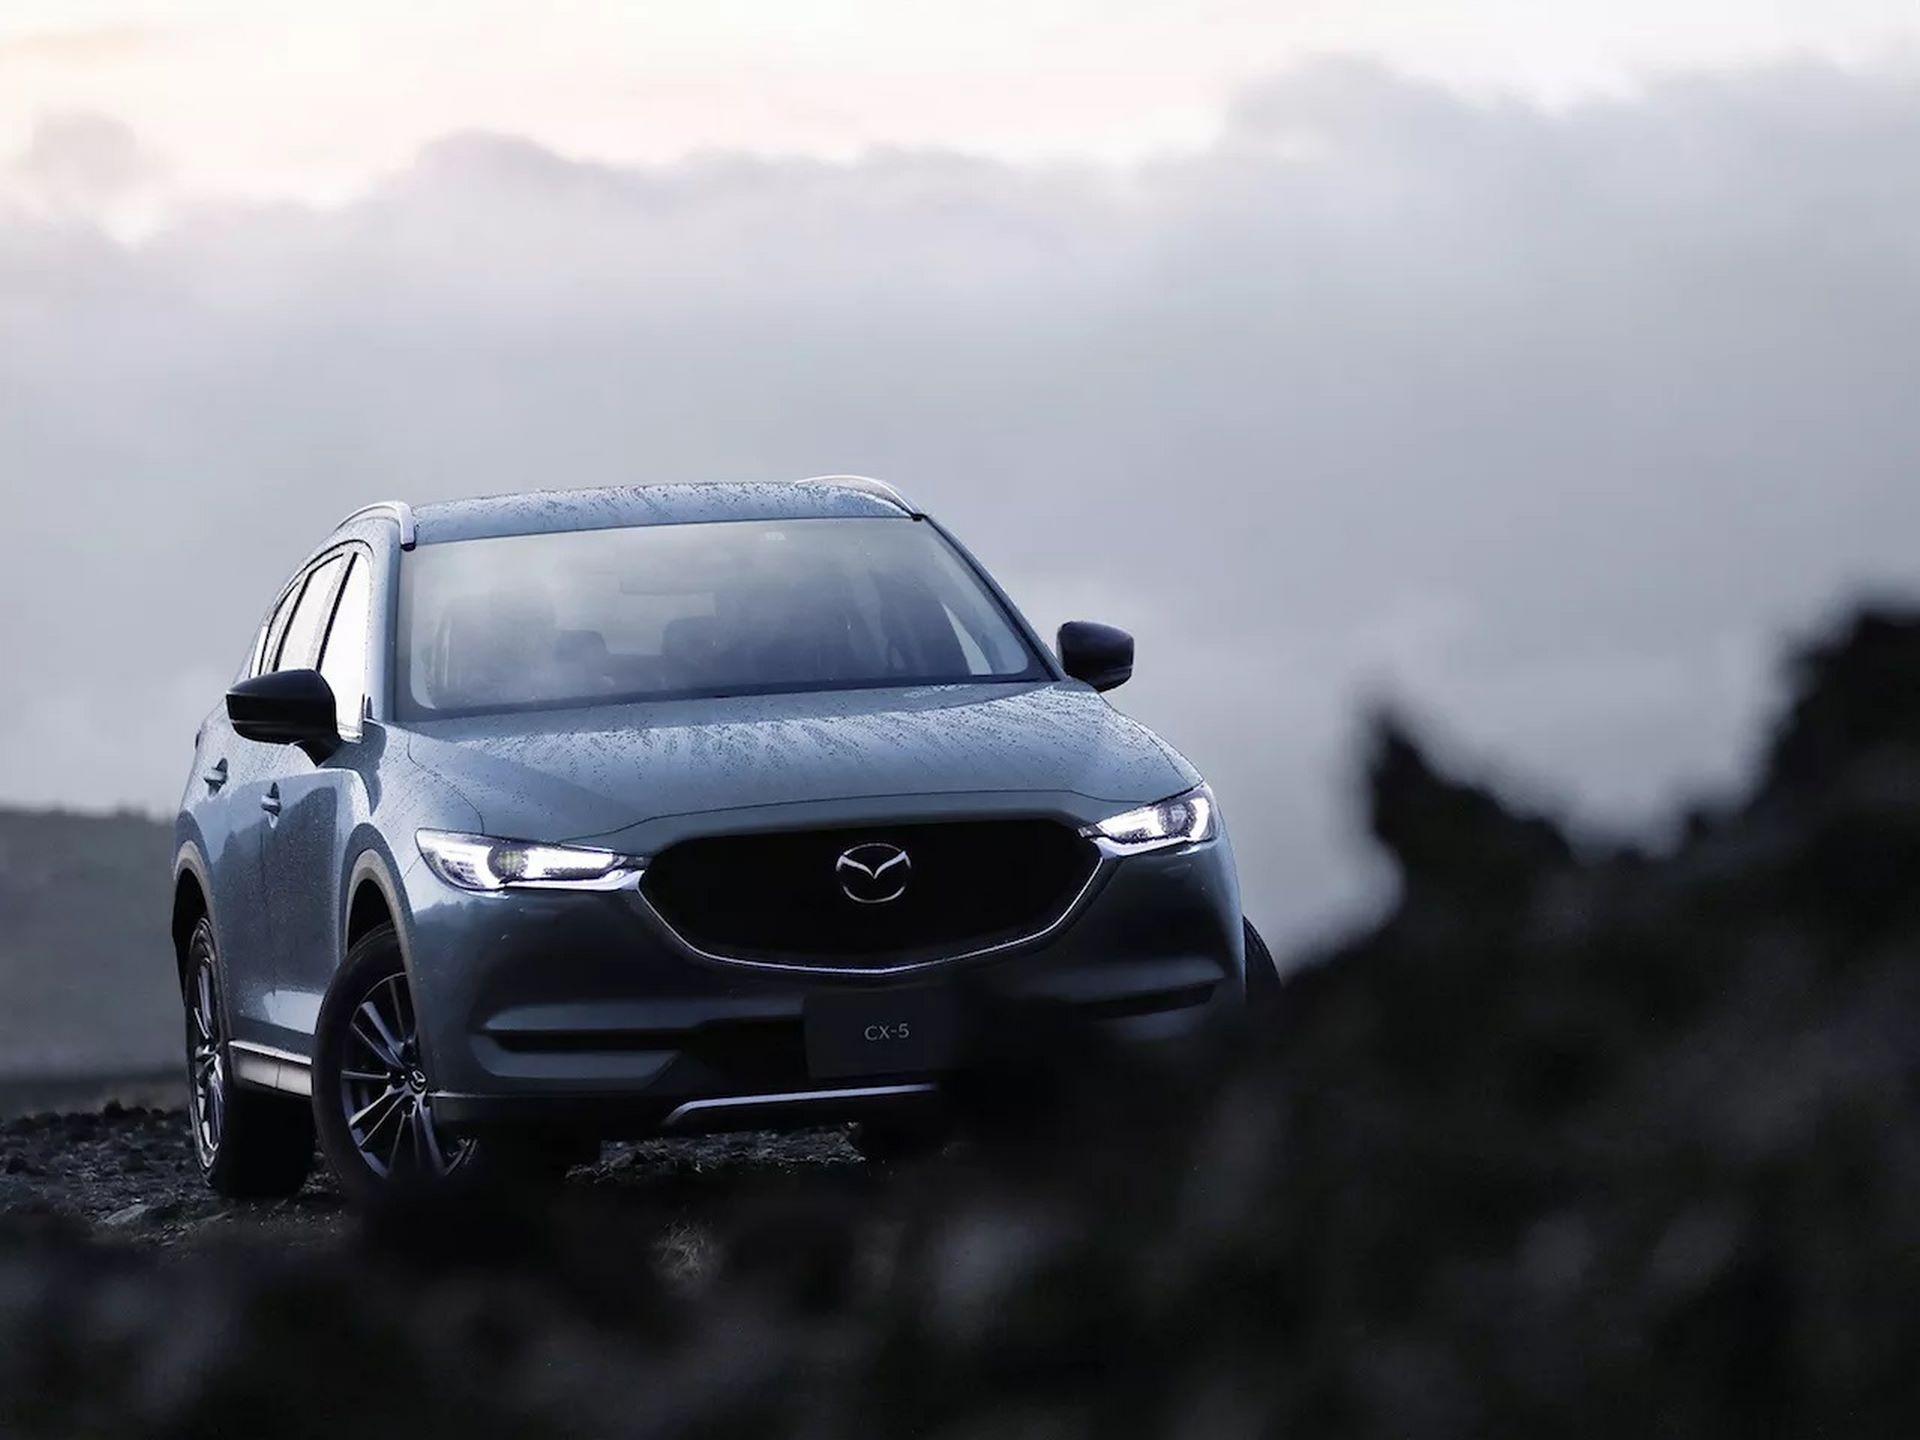 Mazda-MX-5-and-CX-5-2020-15